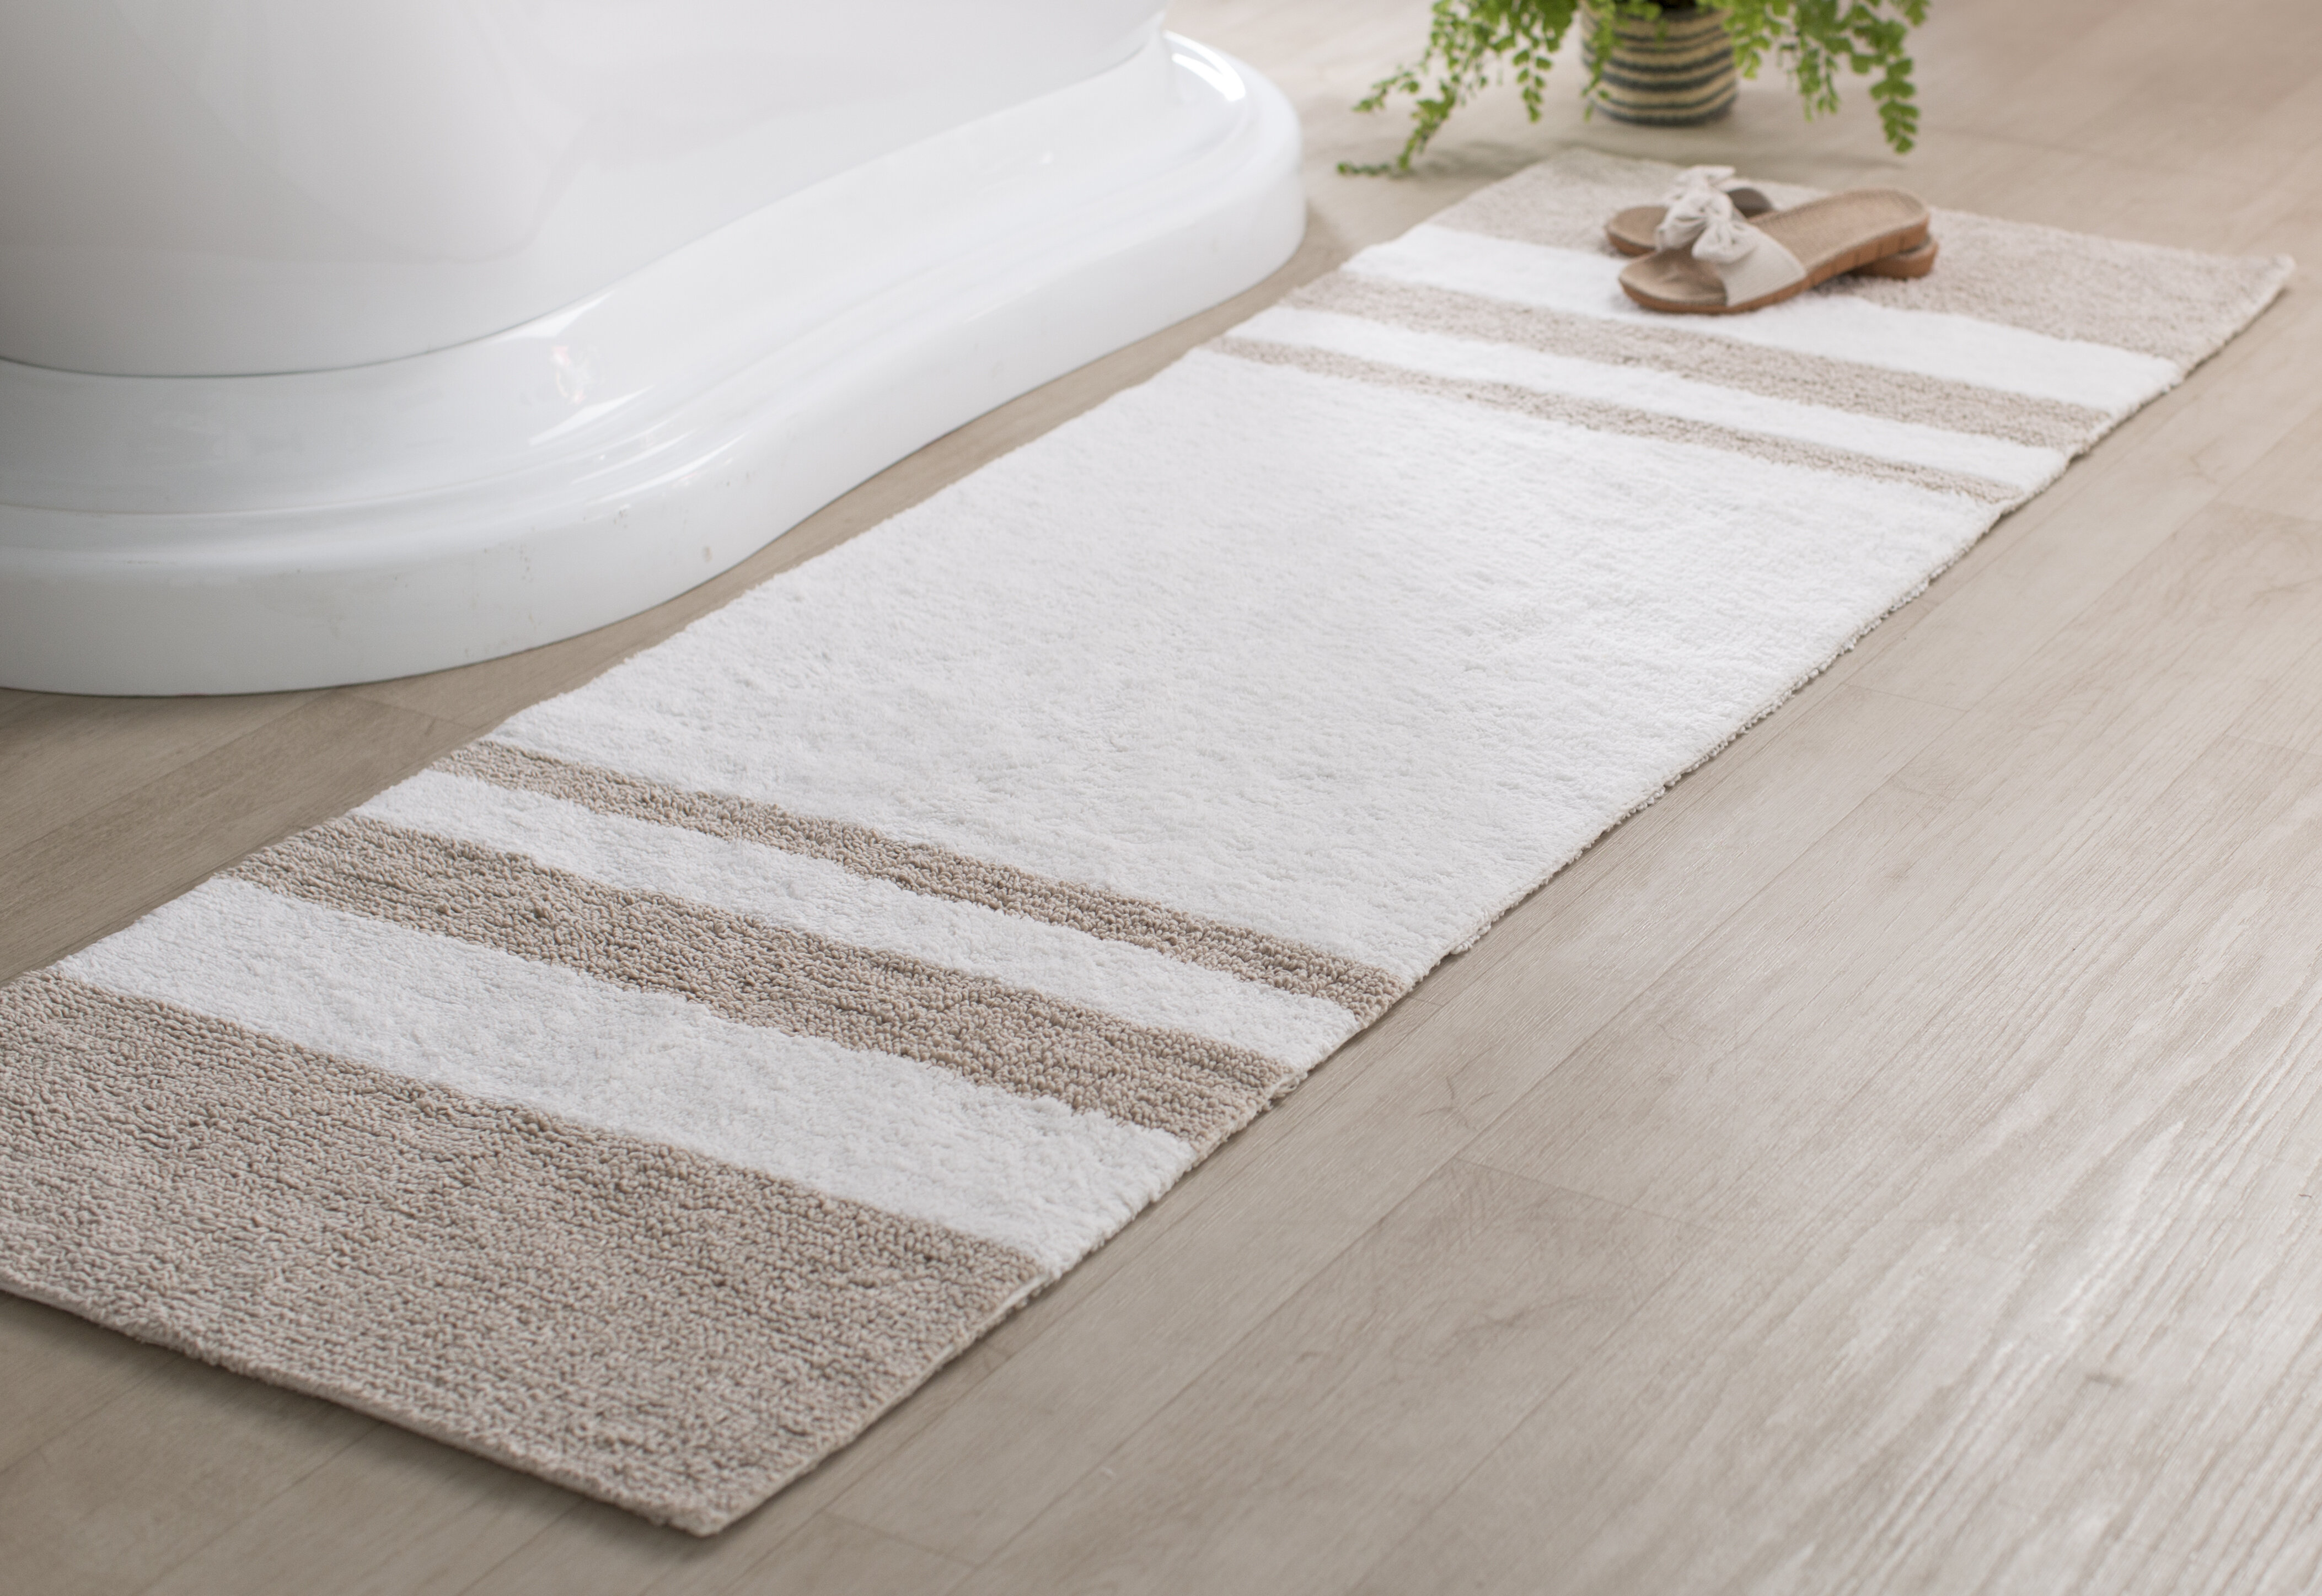 Beachcrest Home Rosenbloom Rectangular 100 Cotton Striped Bath Rug Reviews